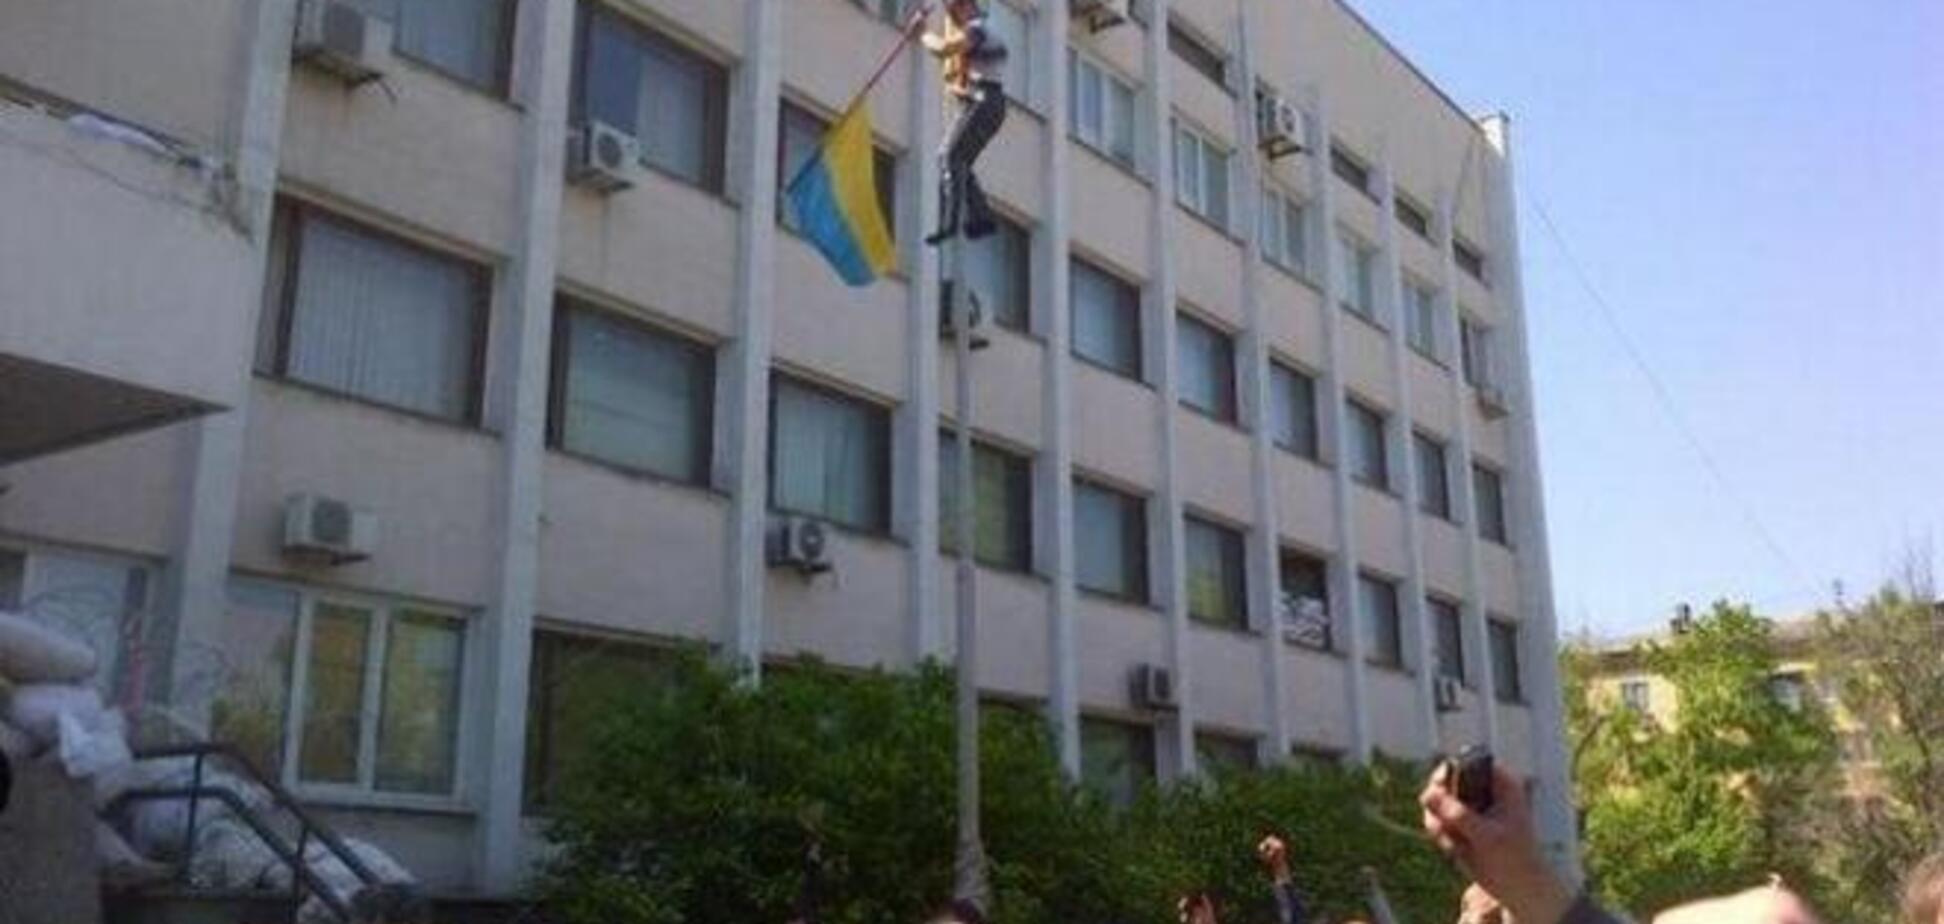 Над горсоветом Мариуполя опять повесили флаг ДНР